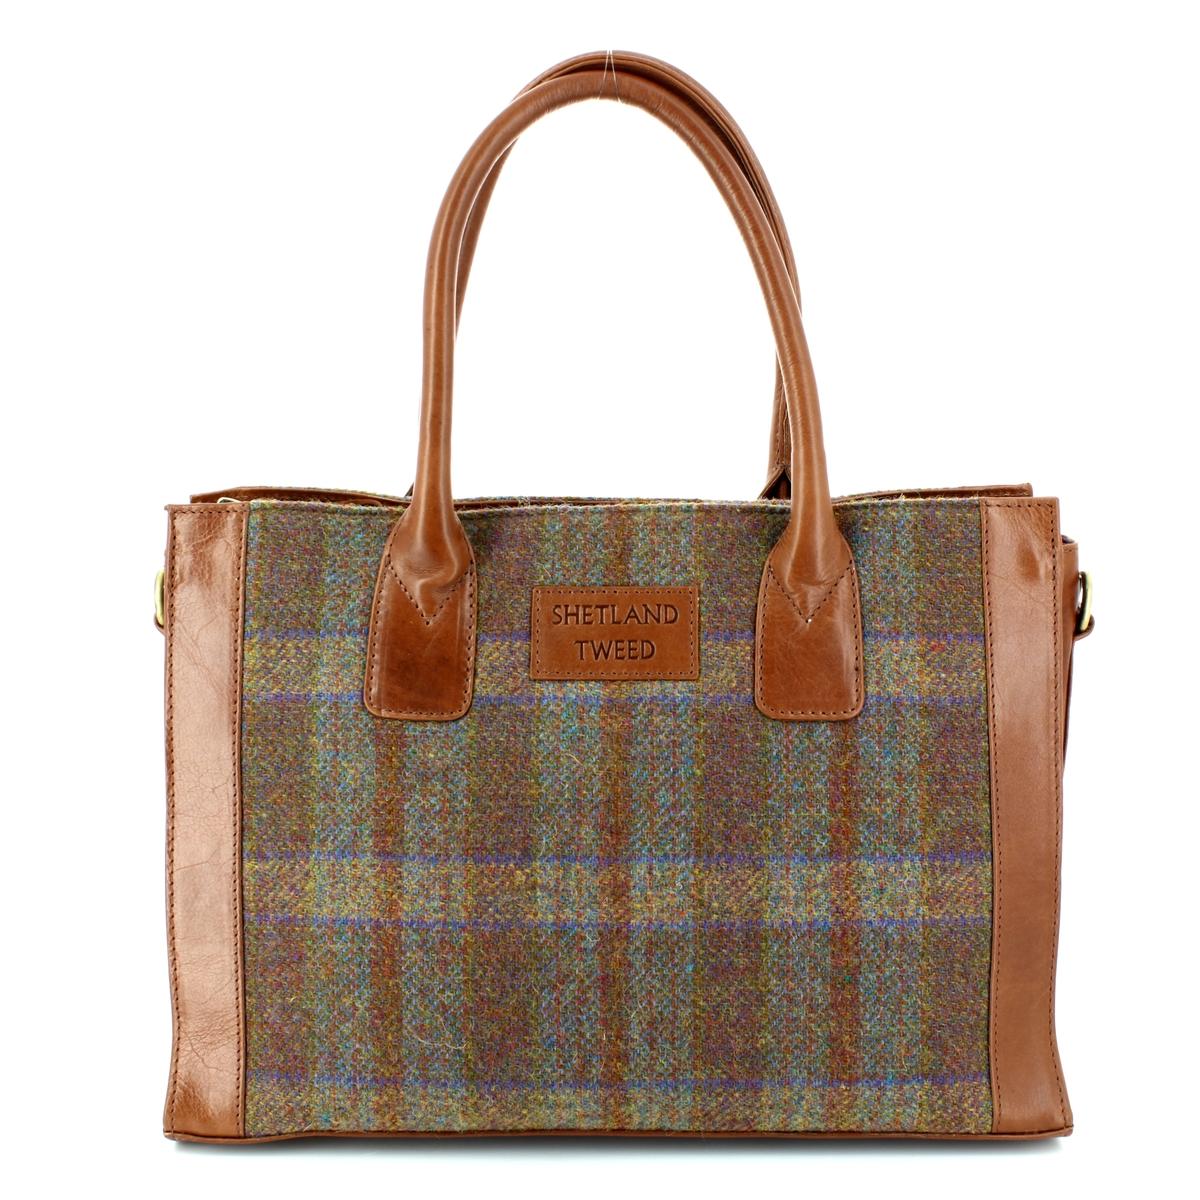 Win a Shetland Tweed Bag & Purse